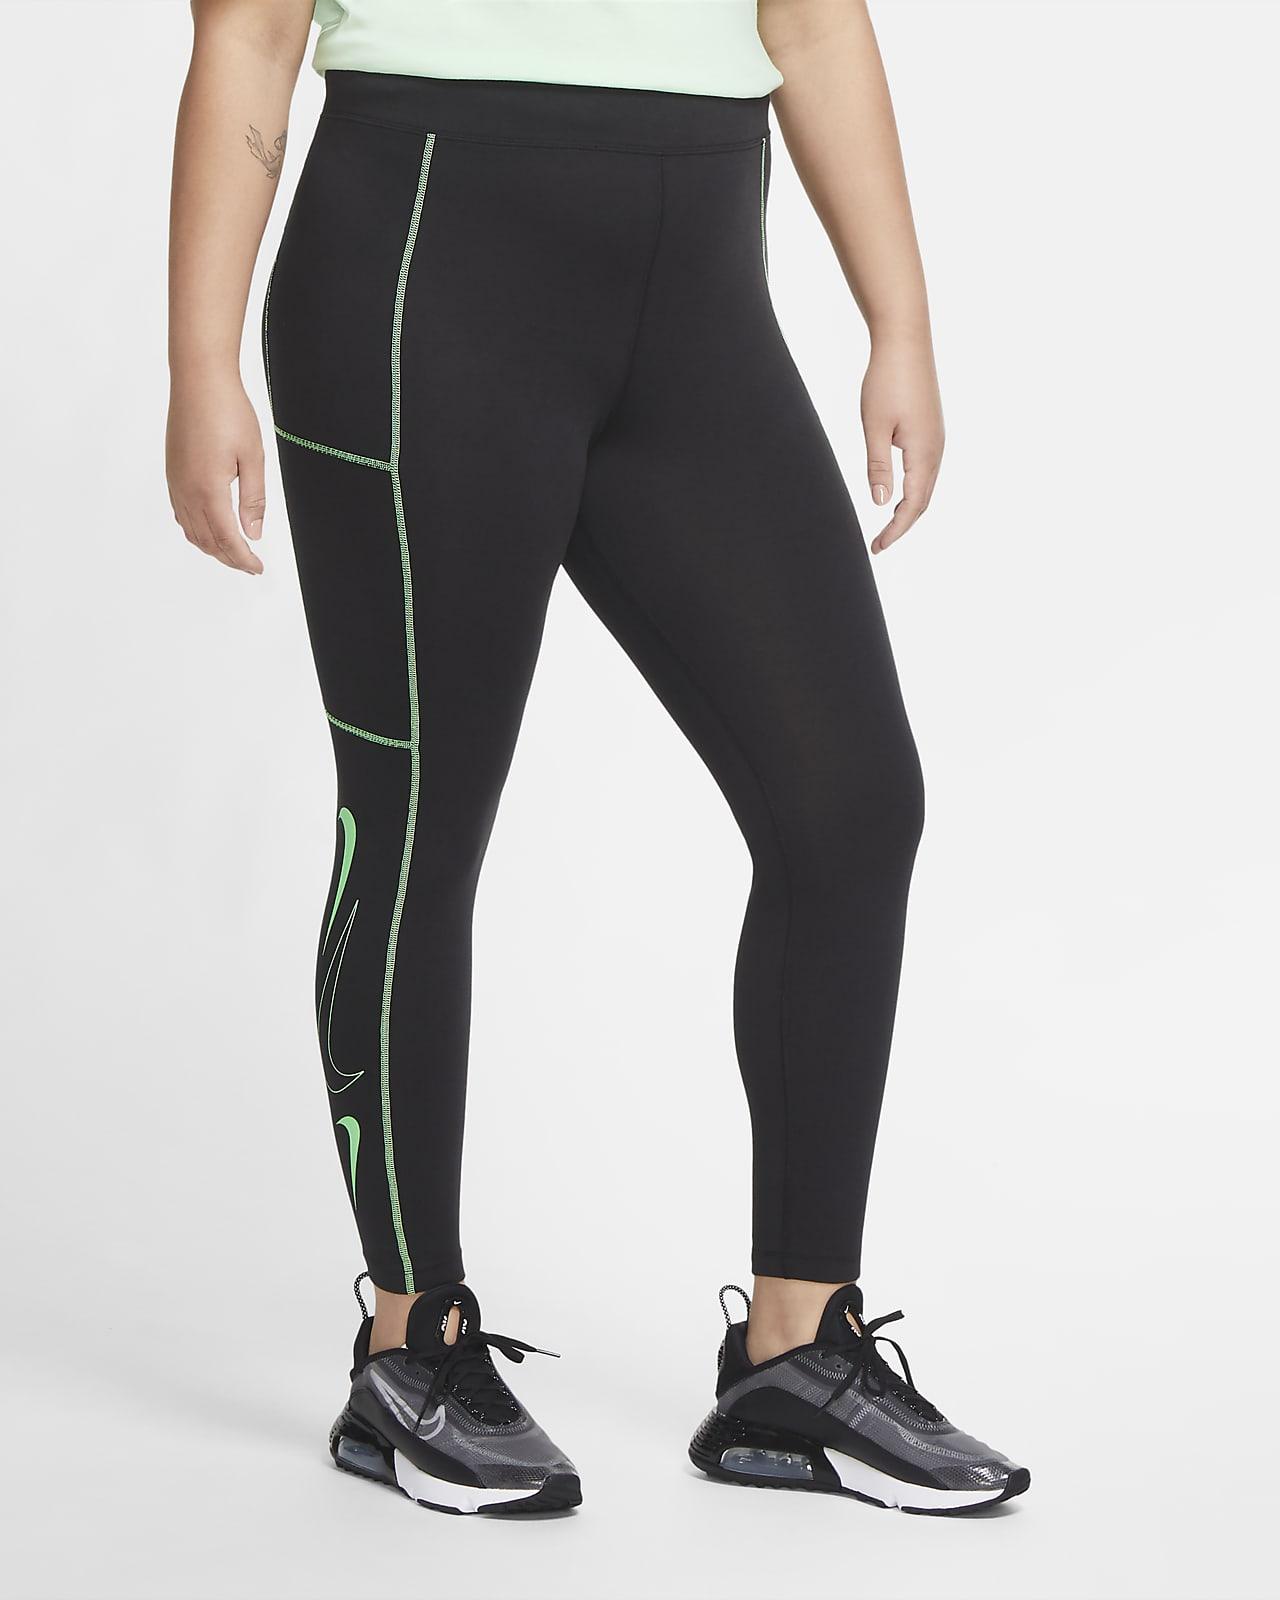 Legging taille haute Nike Sportswear Swoosh pour Femme (grande taille)